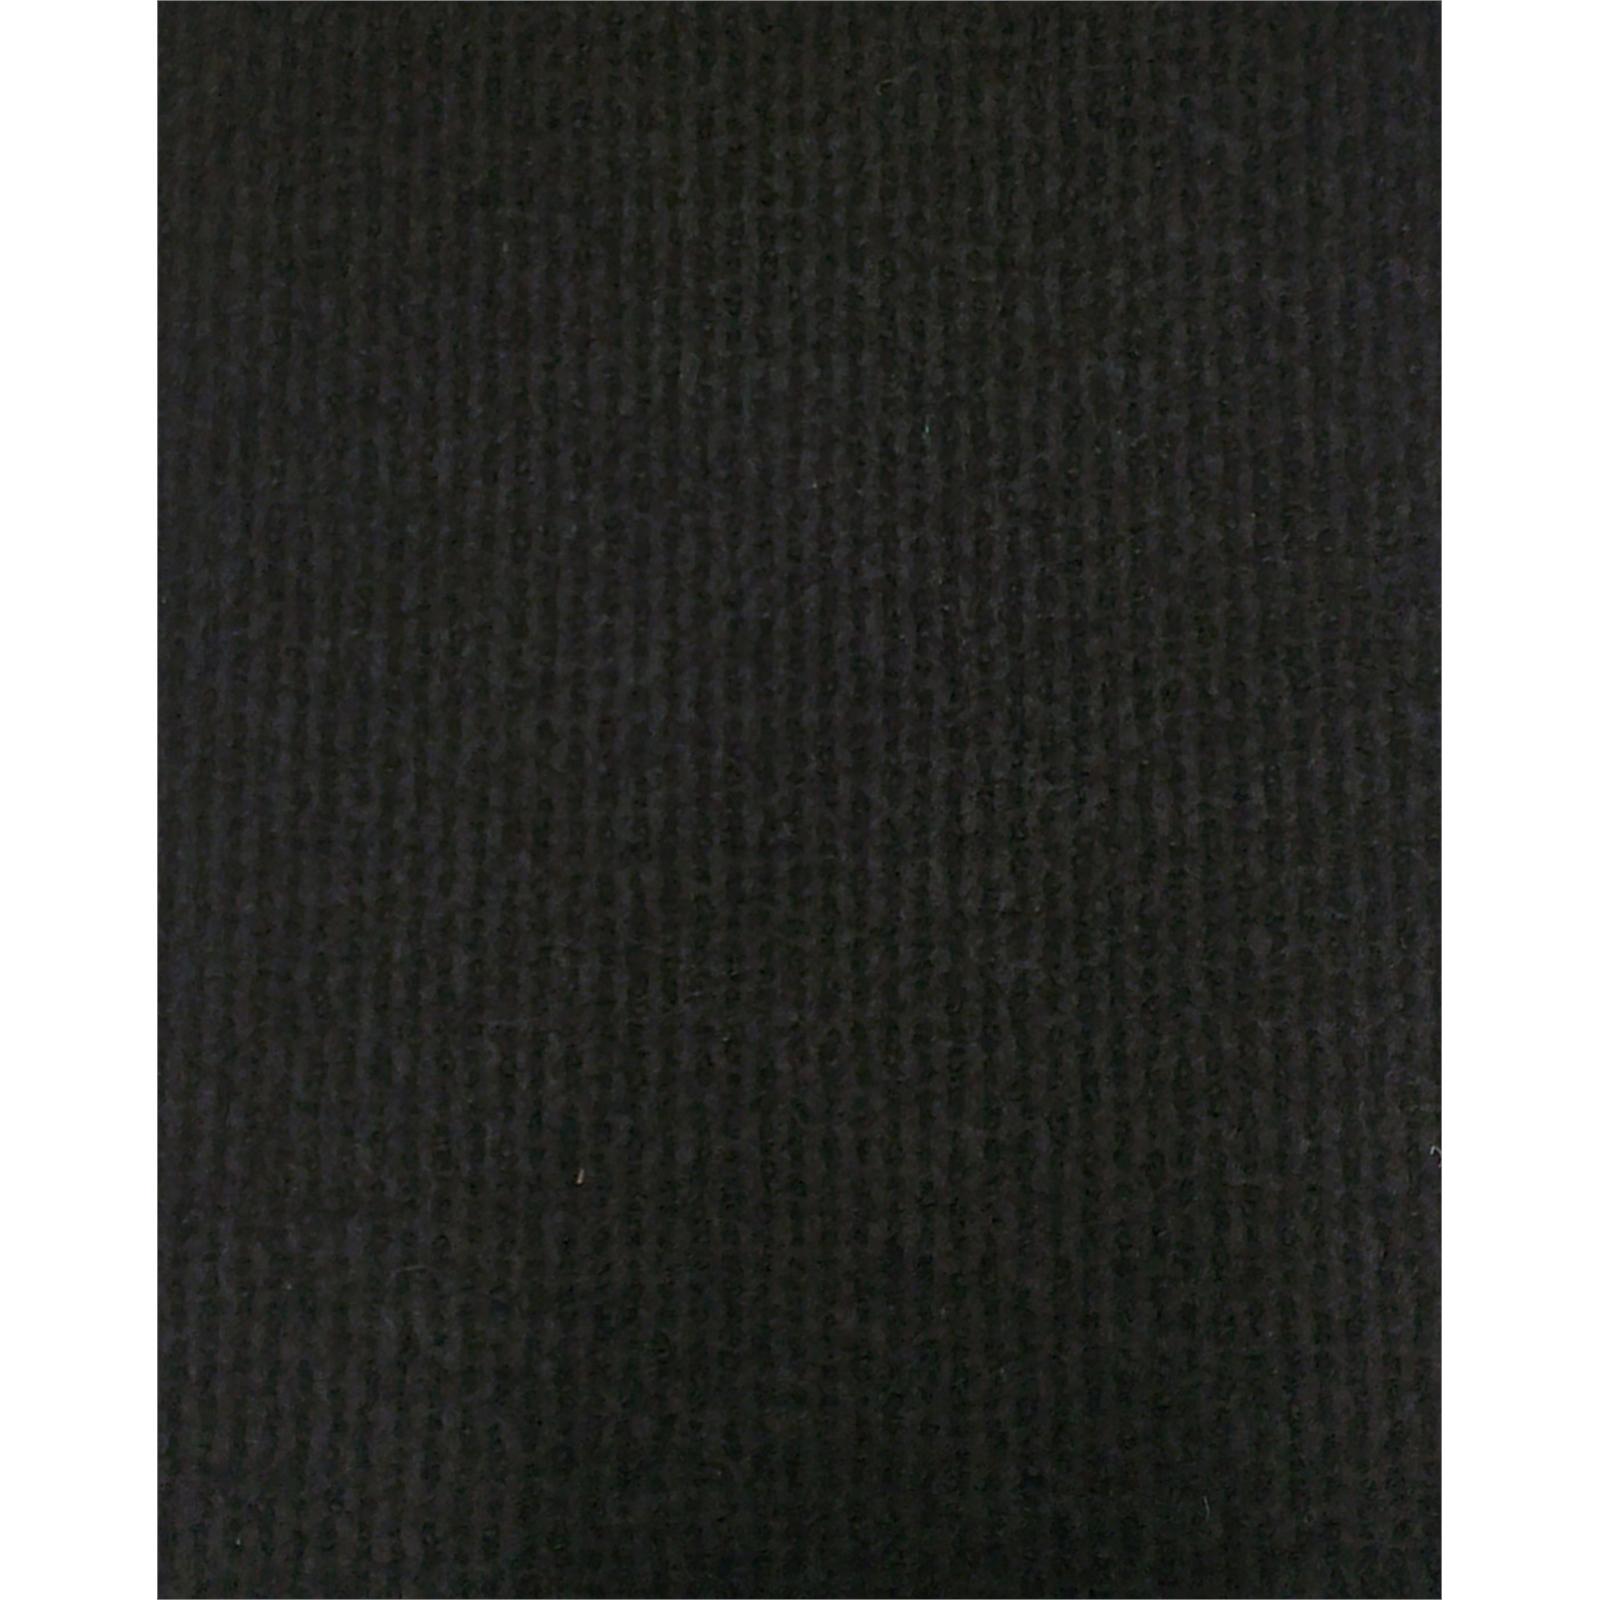 Ideal DIY Floors 2m Black Deco Ribbed Foambak Indoor Carpet